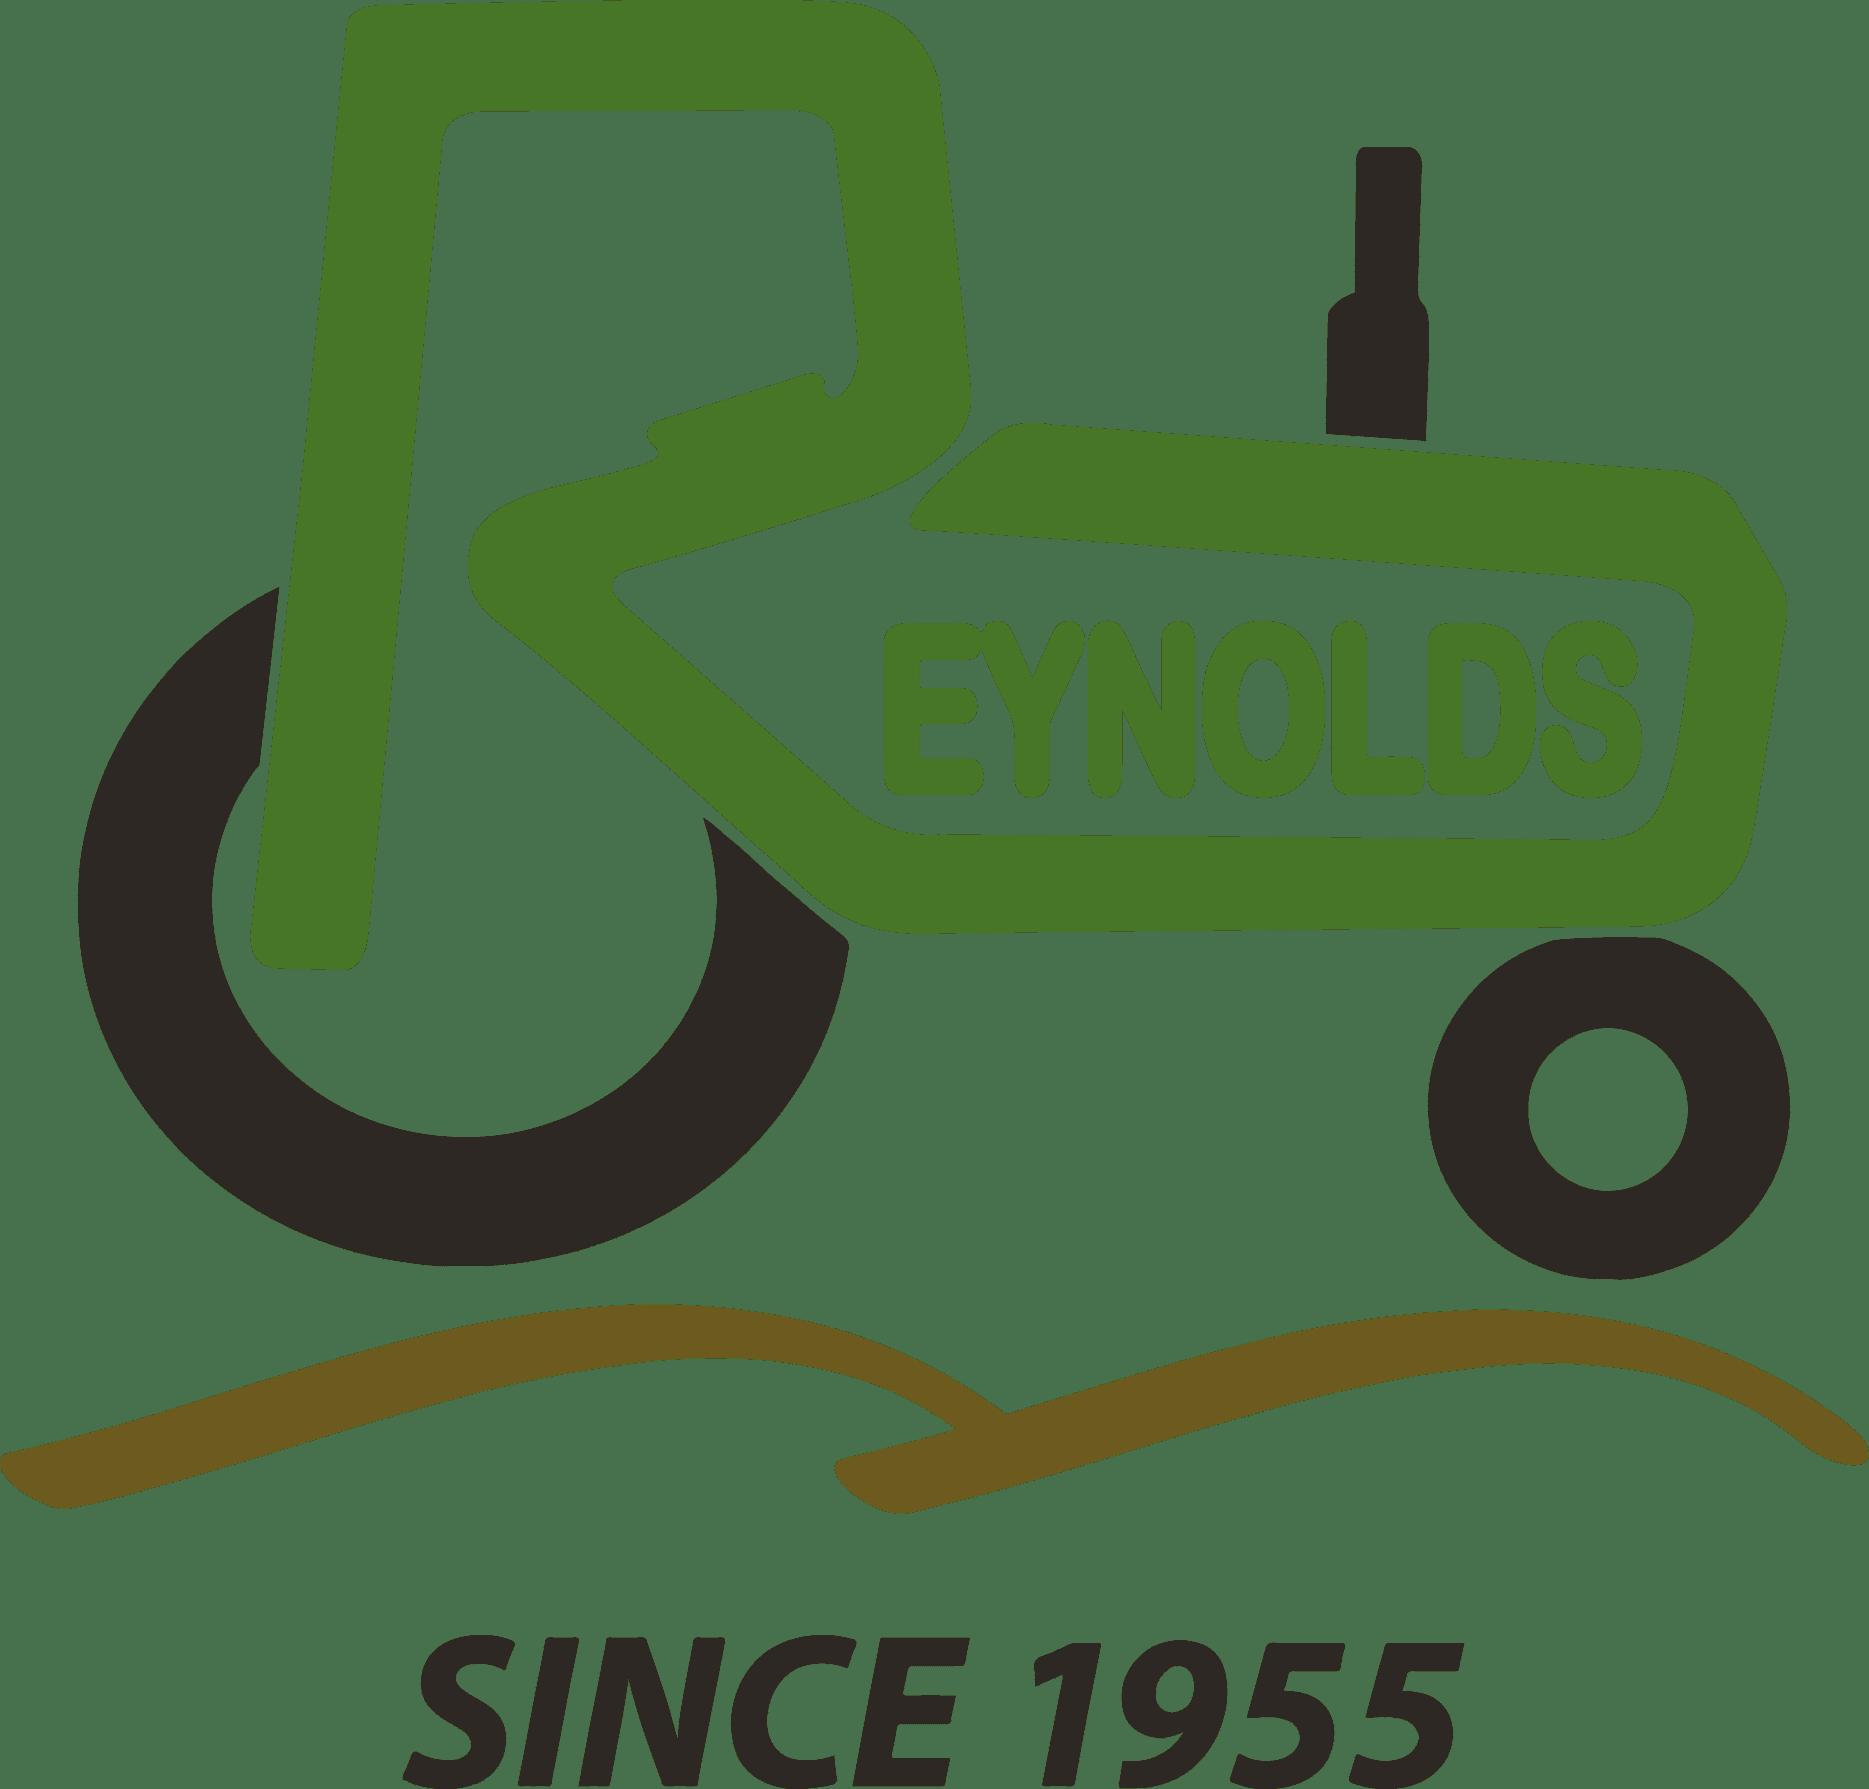 Reynolds Farm Equipment Color